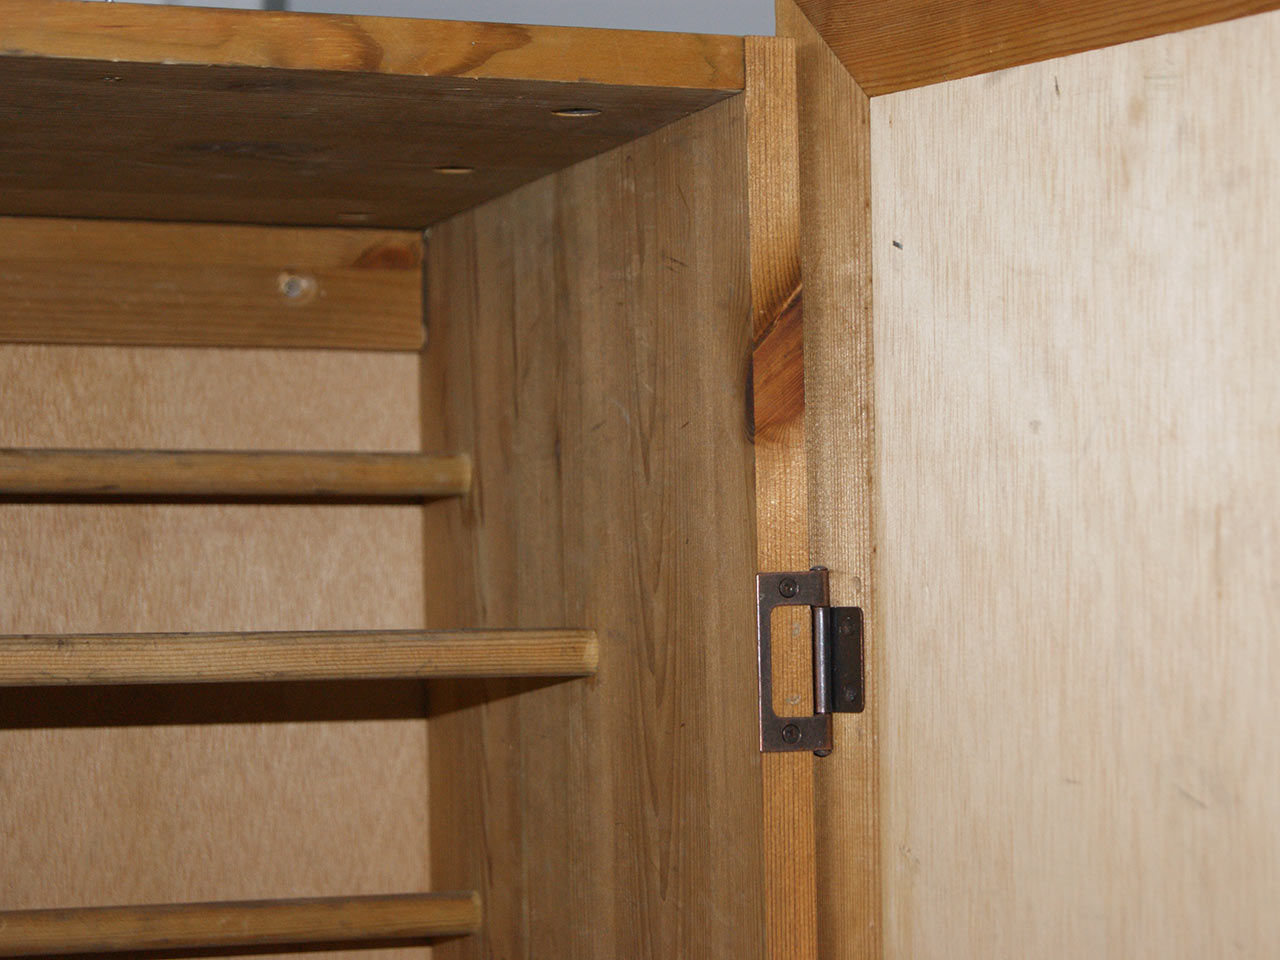 schuhh ngeschrank schuhschrank landhausstil fichte massiv. Black Bedroom Furniture Sets. Home Design Ideas